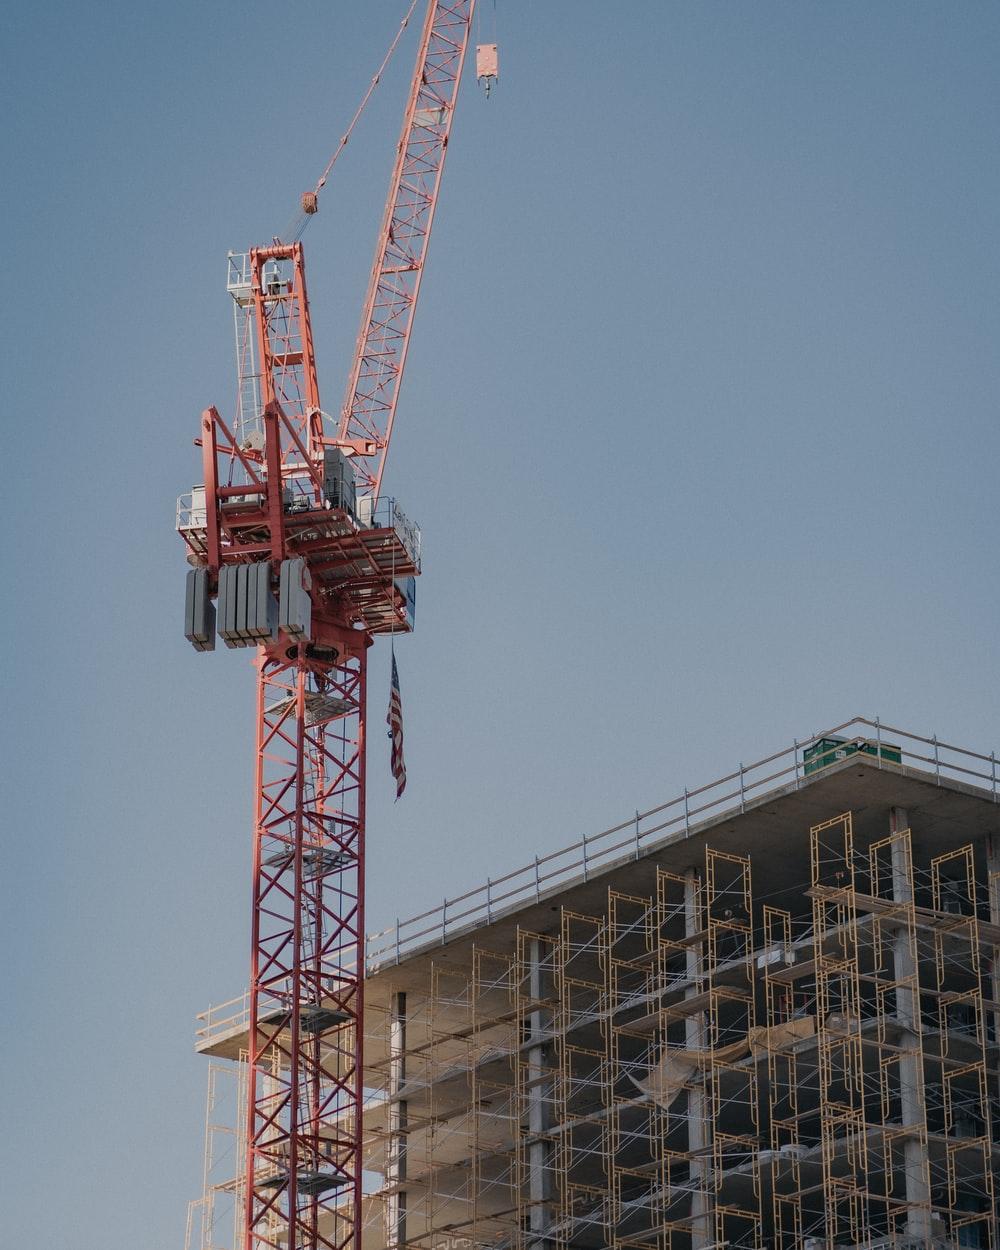 Crane above a building in progress